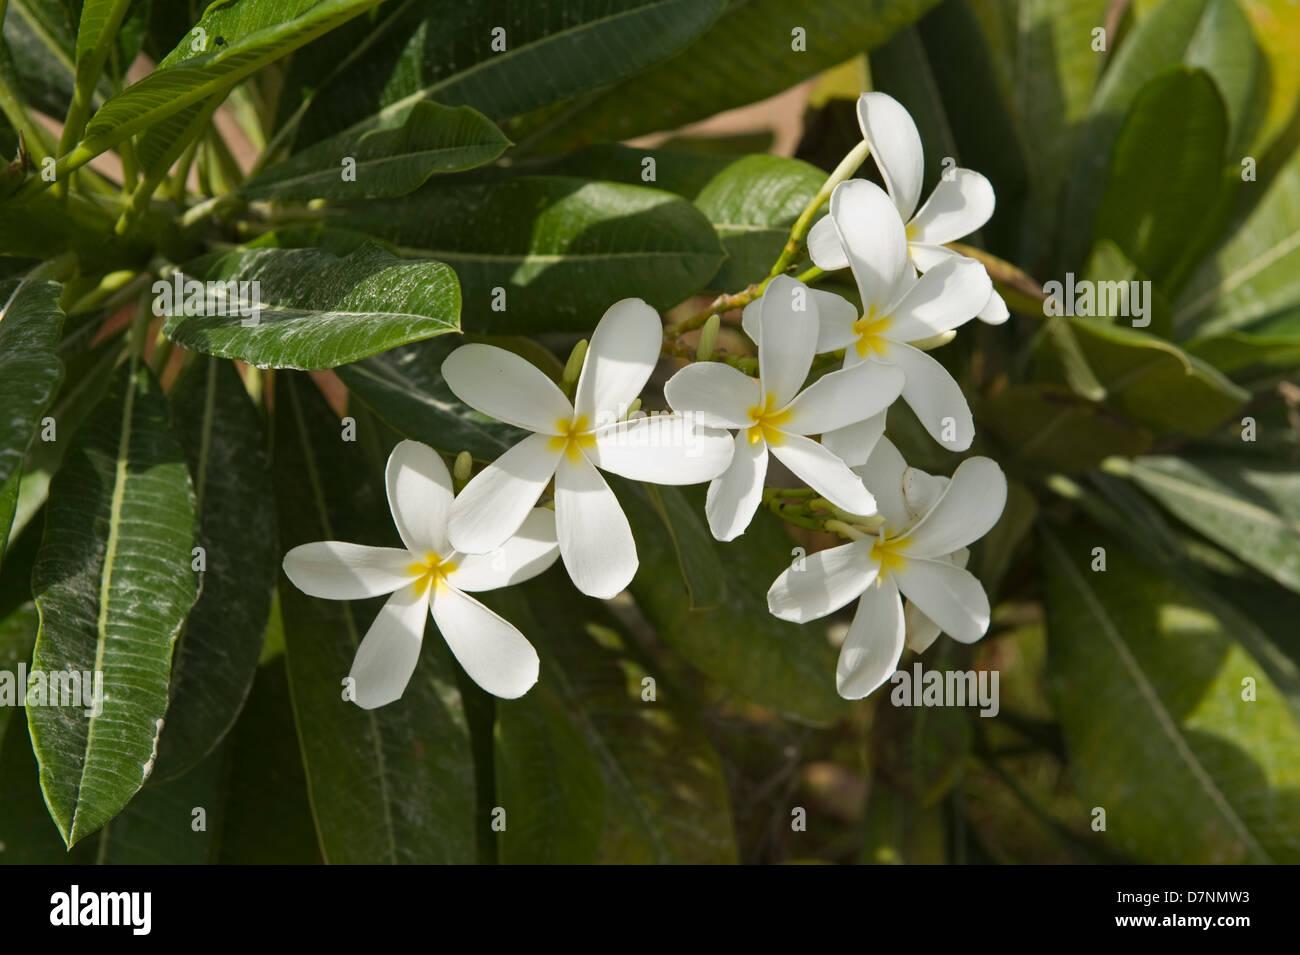 Bianco, plumeria Plumeria Alba, fiori e foglie polverose, Abu Dhabi Immagini Stock